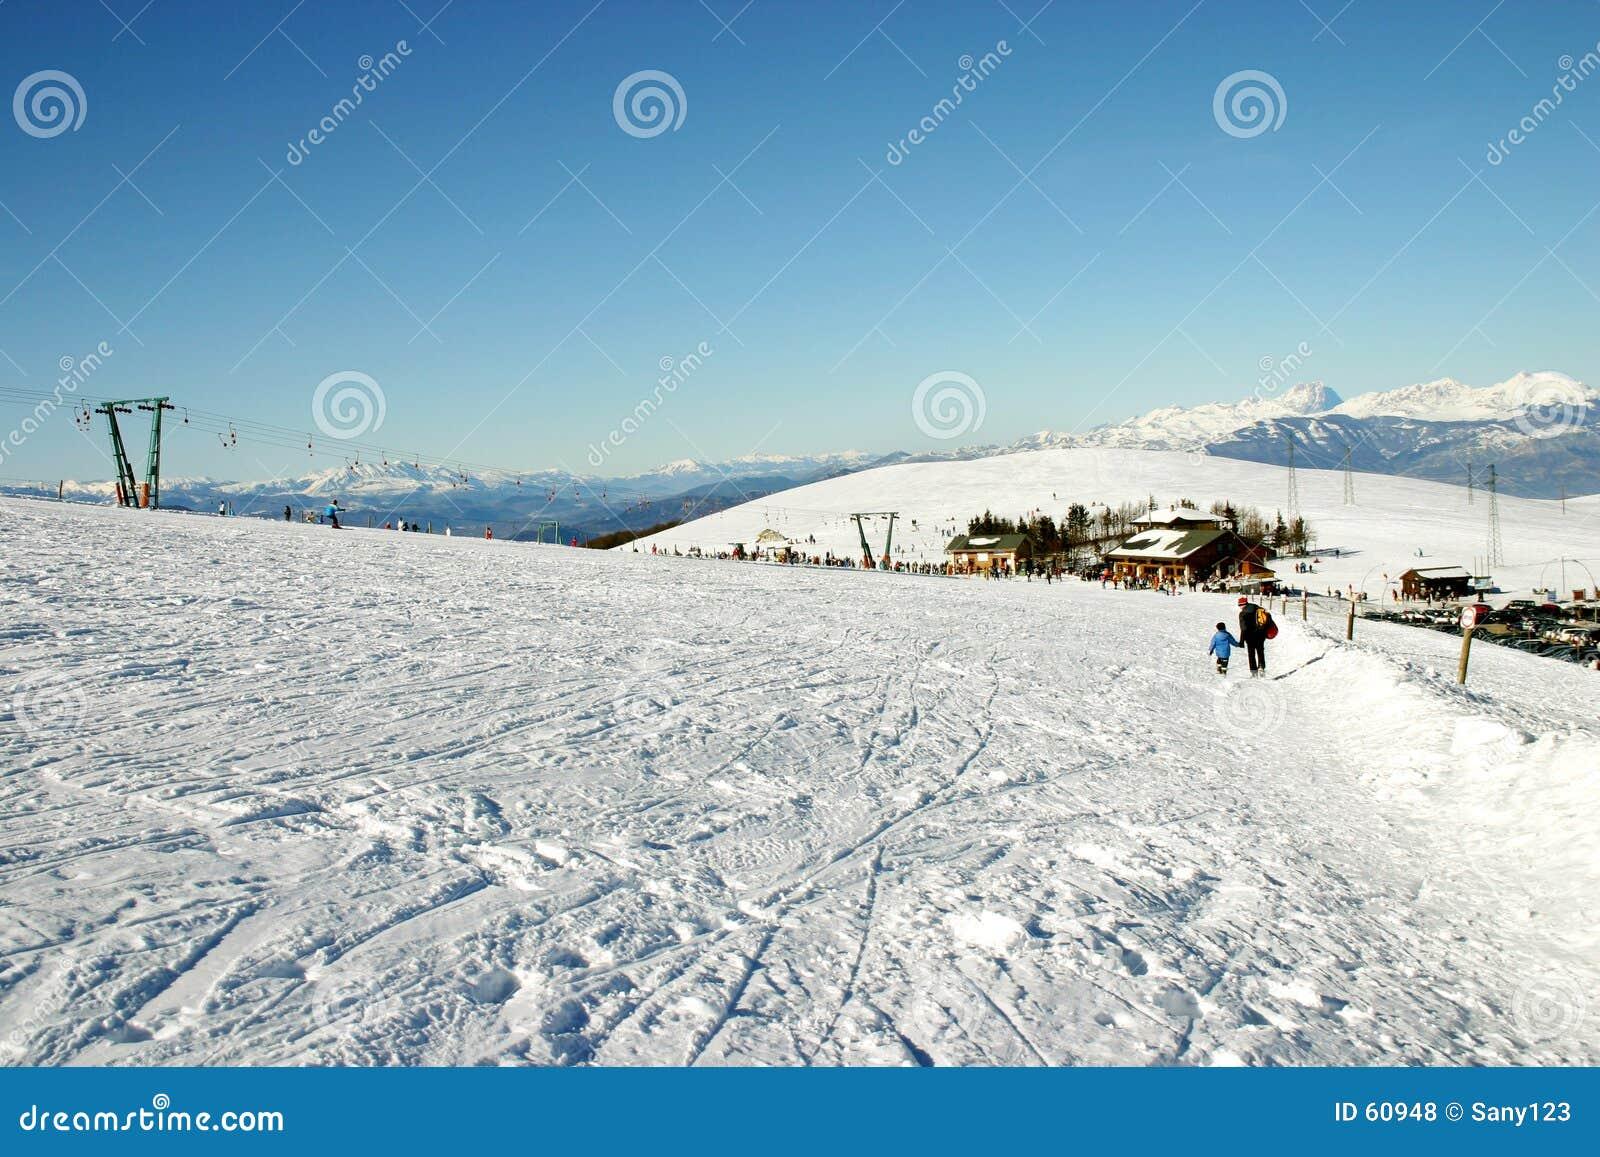 Download κλίσεις σκι στοκ εικόνες. εικόνα από βακκινίων, βουνό, σκι - 60948